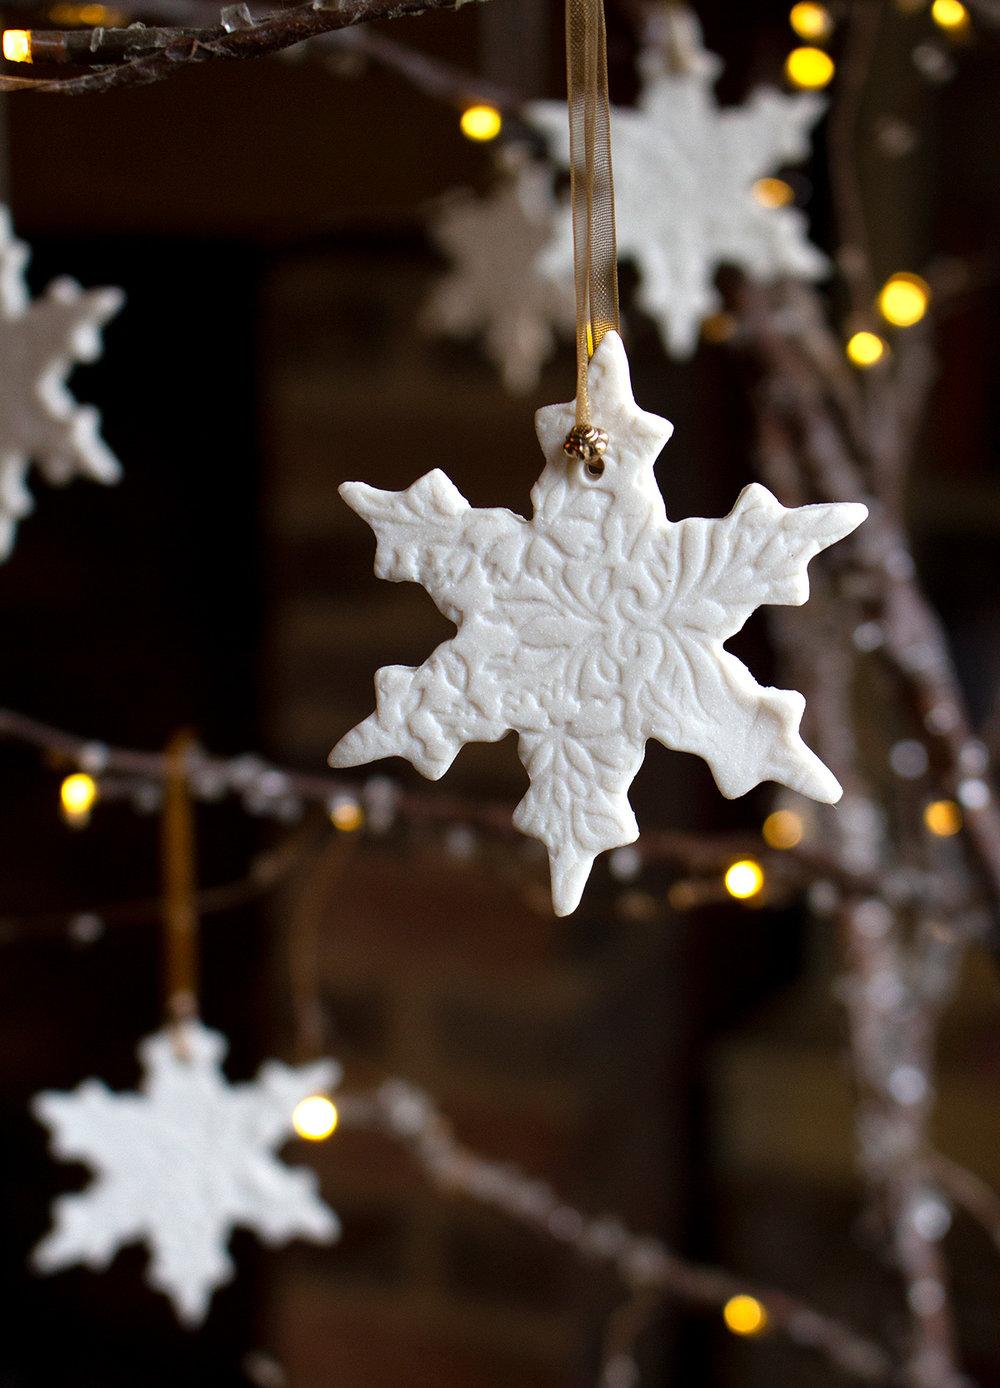 Porcelain snowflake design 1 on tree.jpg